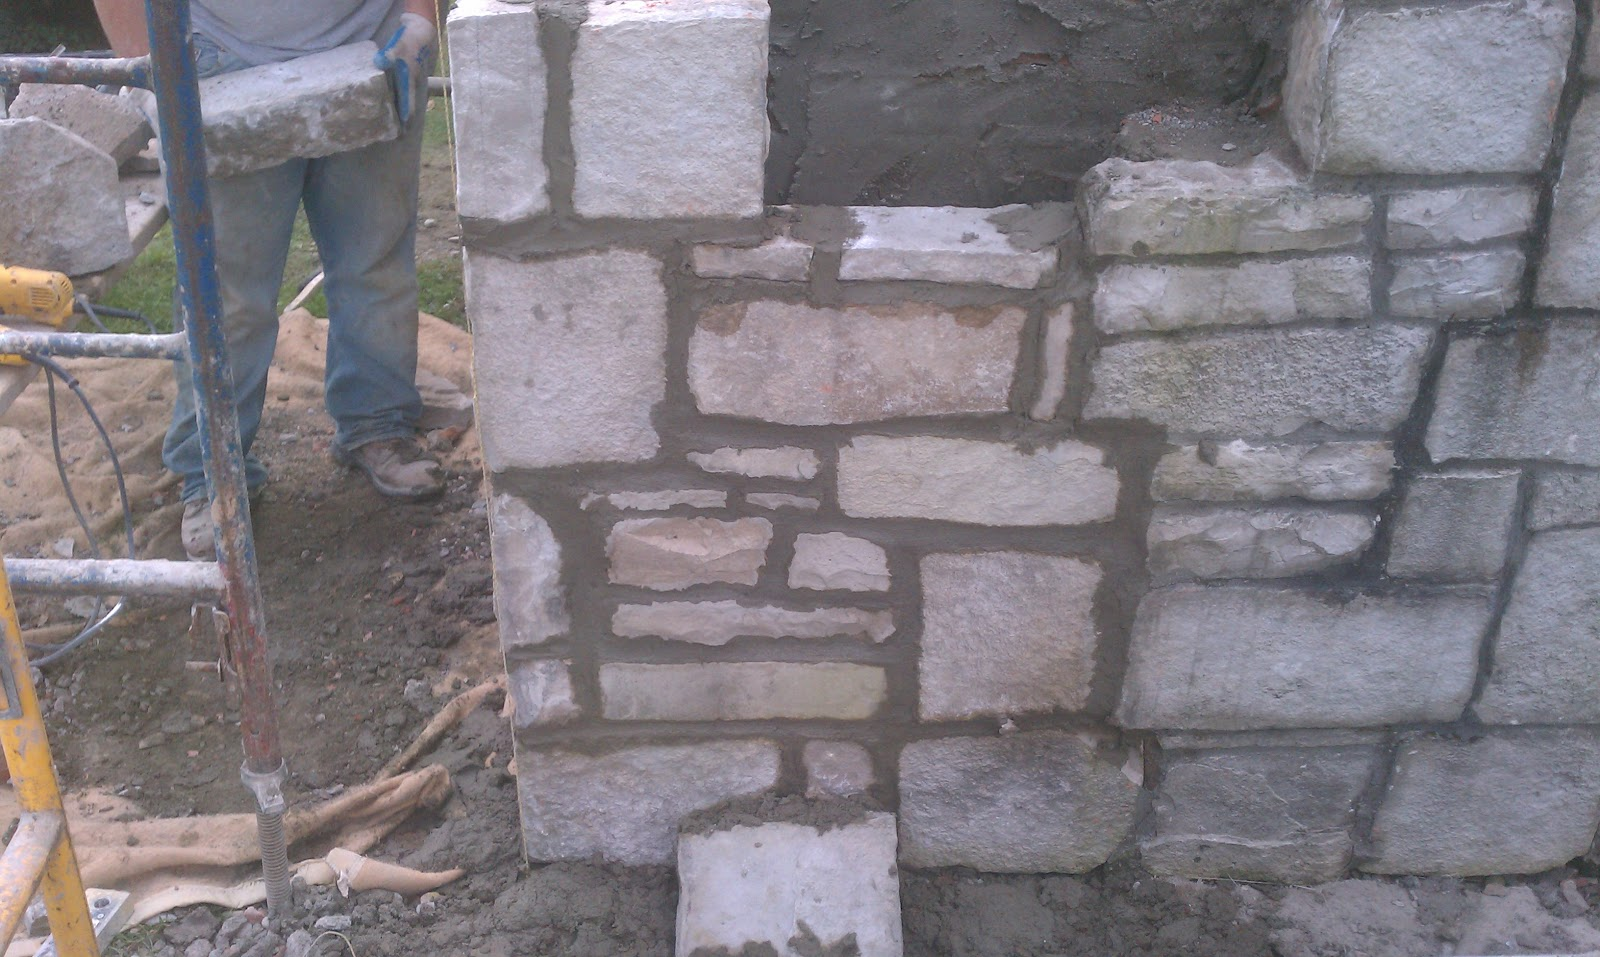 Michigan bricklayers for Stone and brick